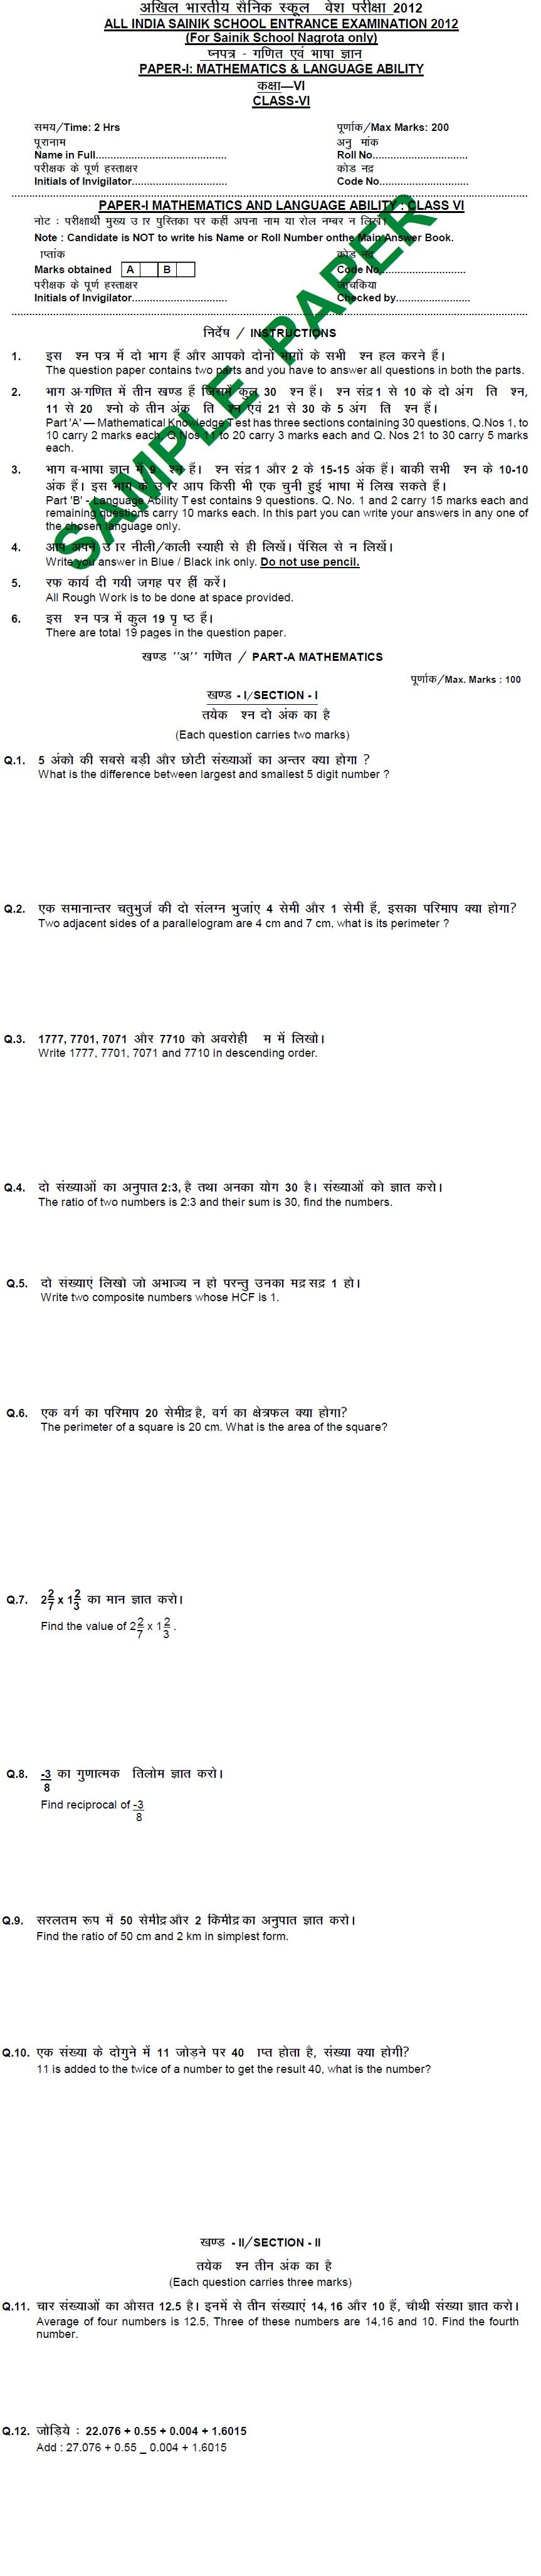 All Indian Sainik School Entrance Exam Sample Paper - Class VI